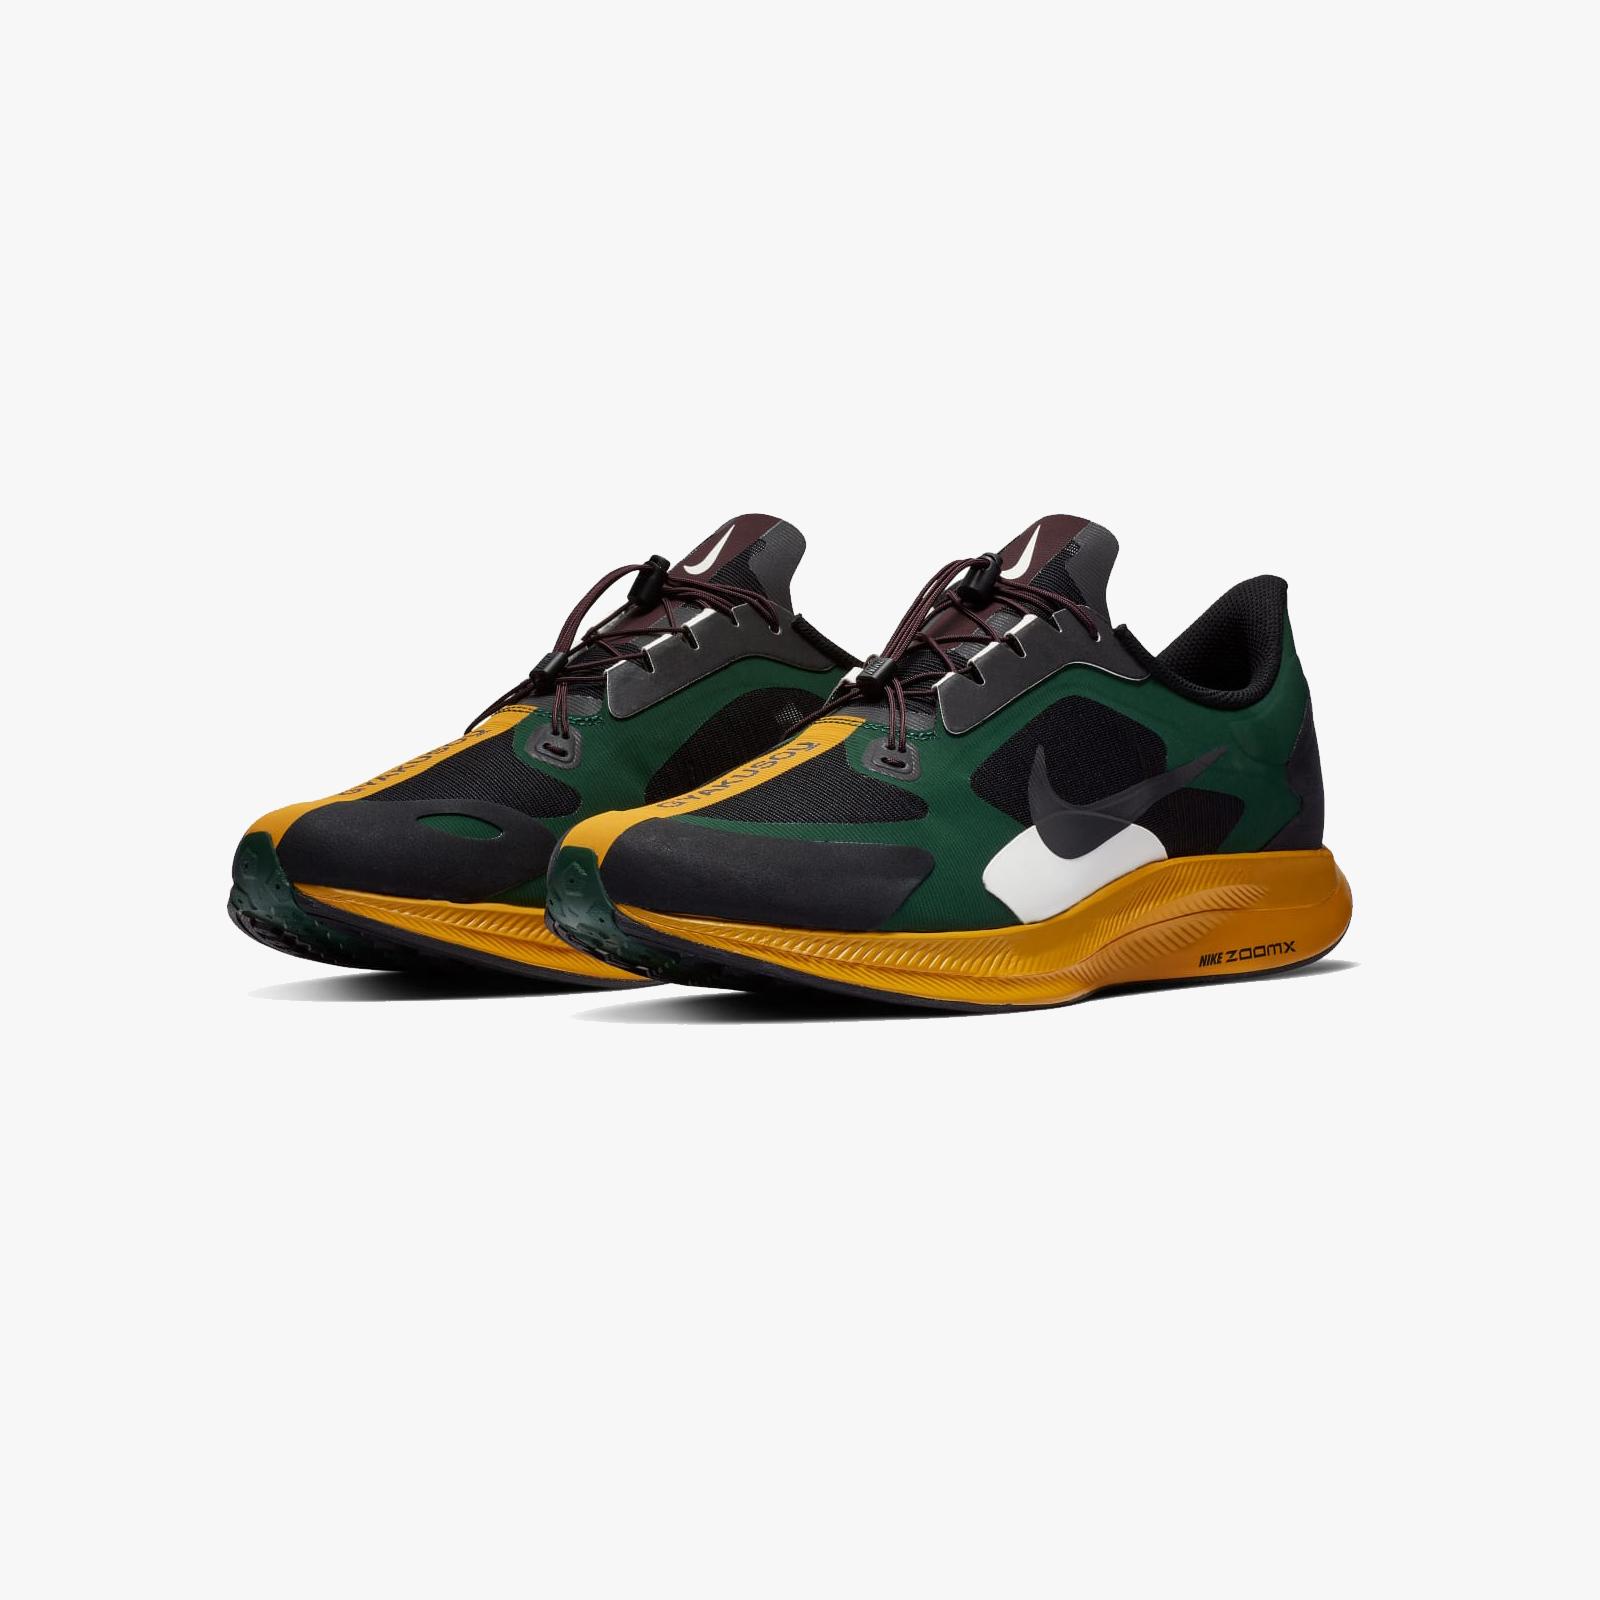 9d26ae9cef59 Nike Zoom Pegasus 35 Turbo x Gyakusou - Bq0579-300 - Sneakersnstuff ...